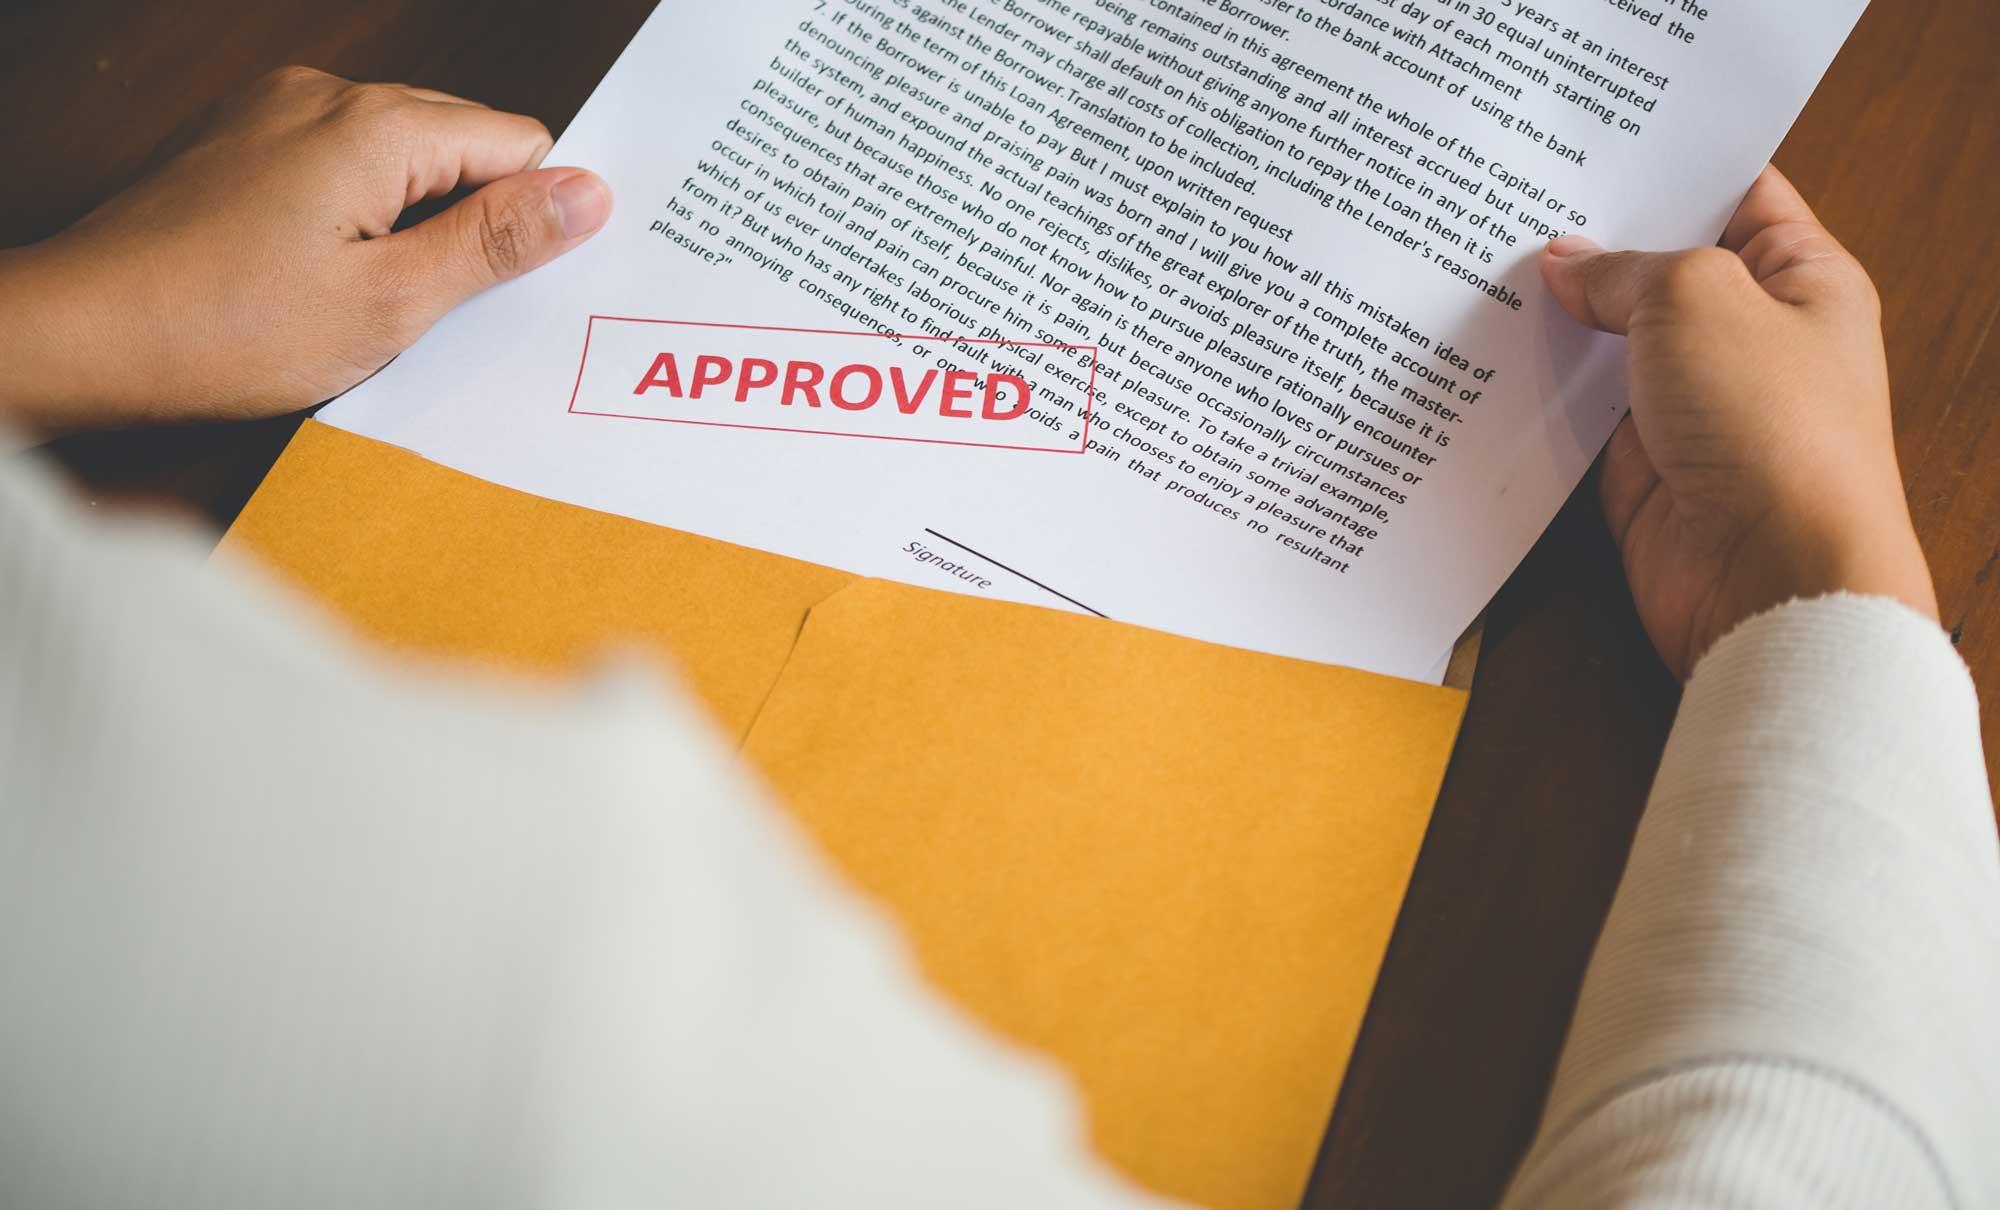 Assurance Emprunteur La Cessation Des Garanties En Cas De